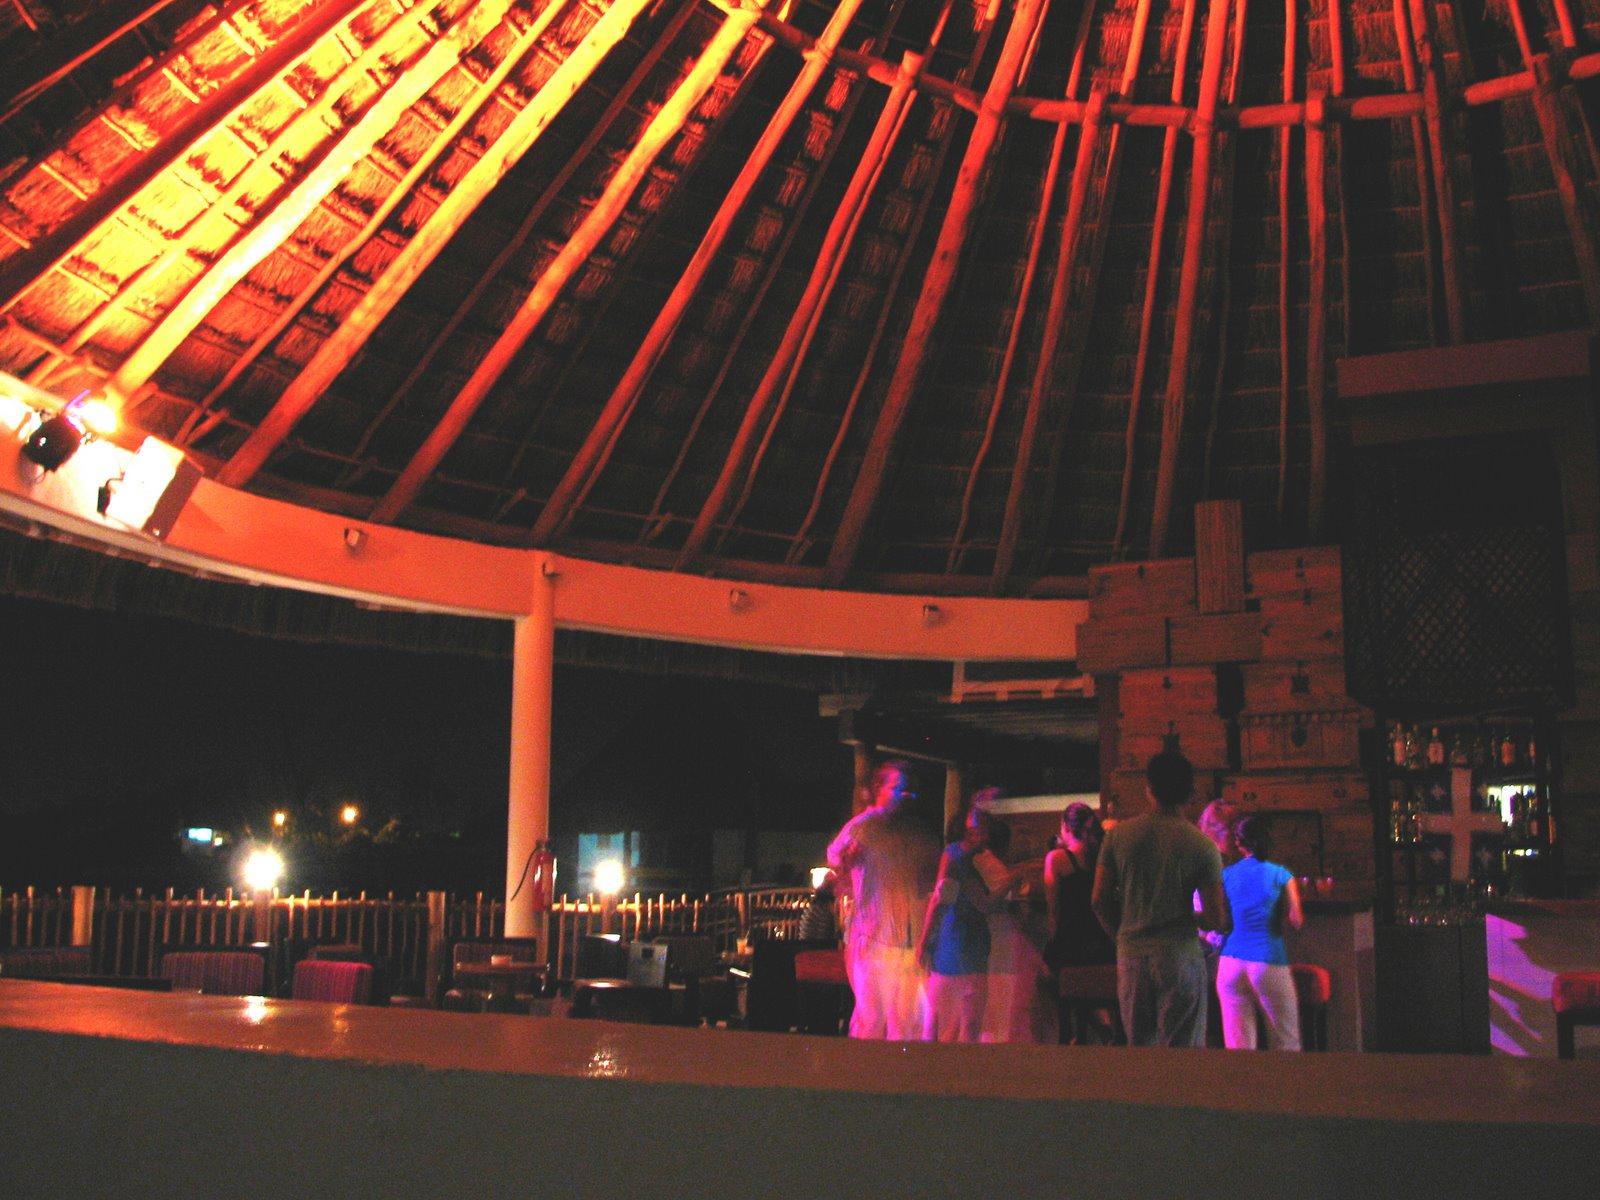 Club Med Cancun technomad install